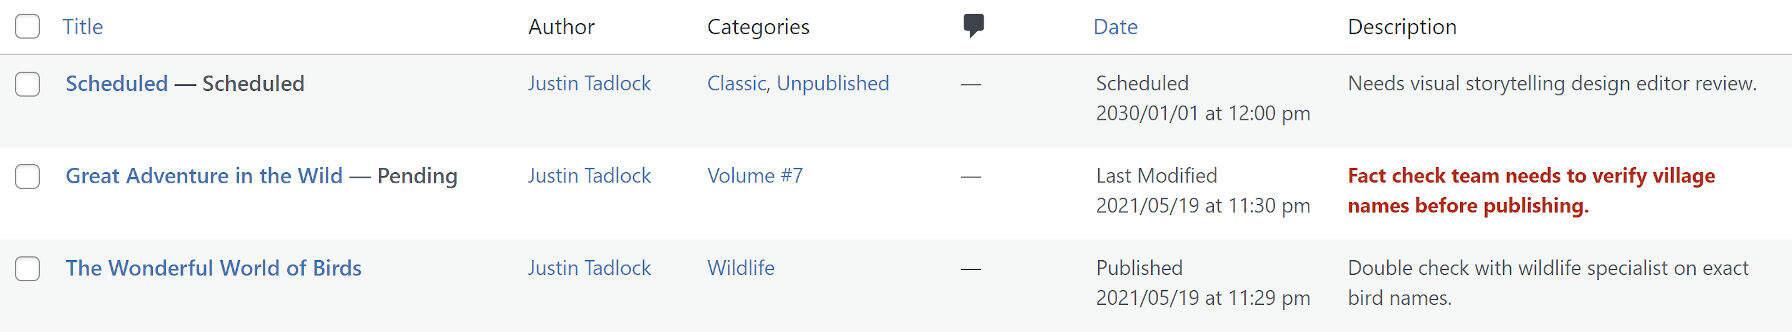 post-descriptions插件文章描述列